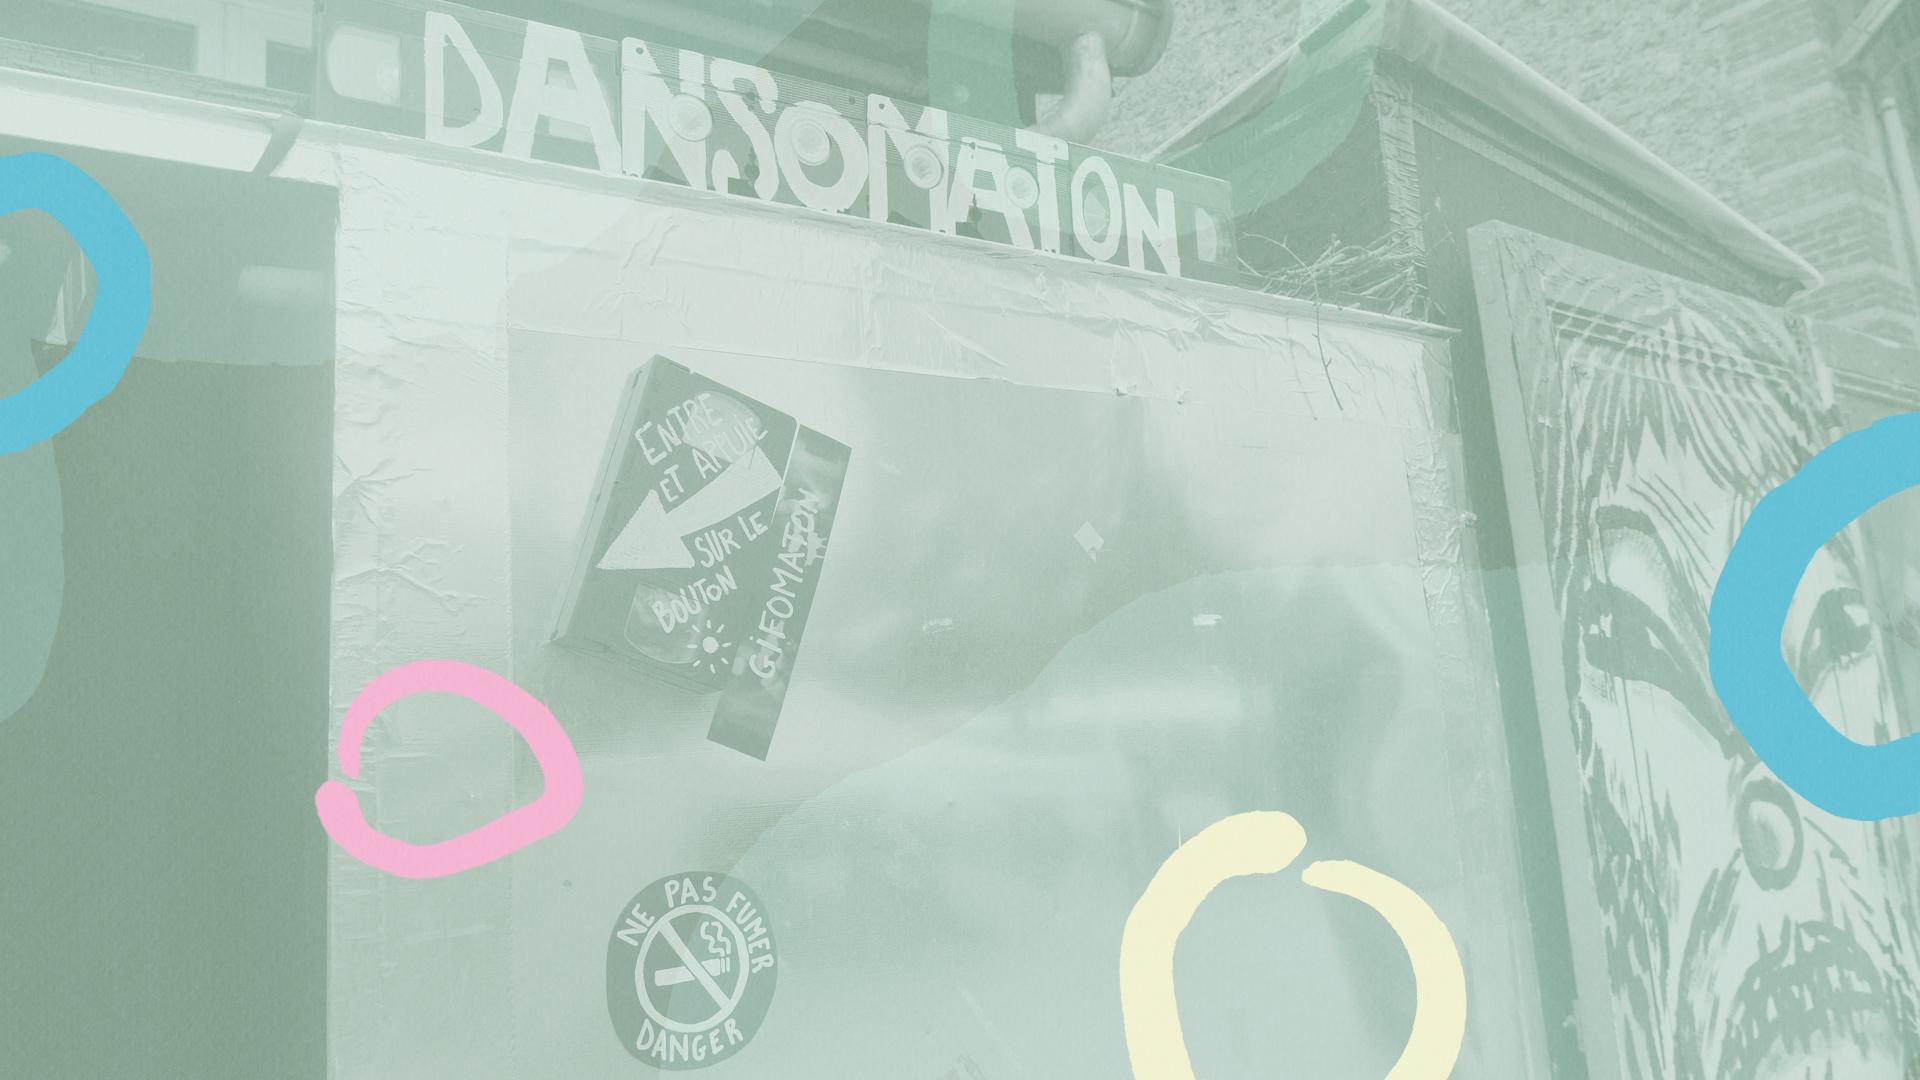 DANSOMATON